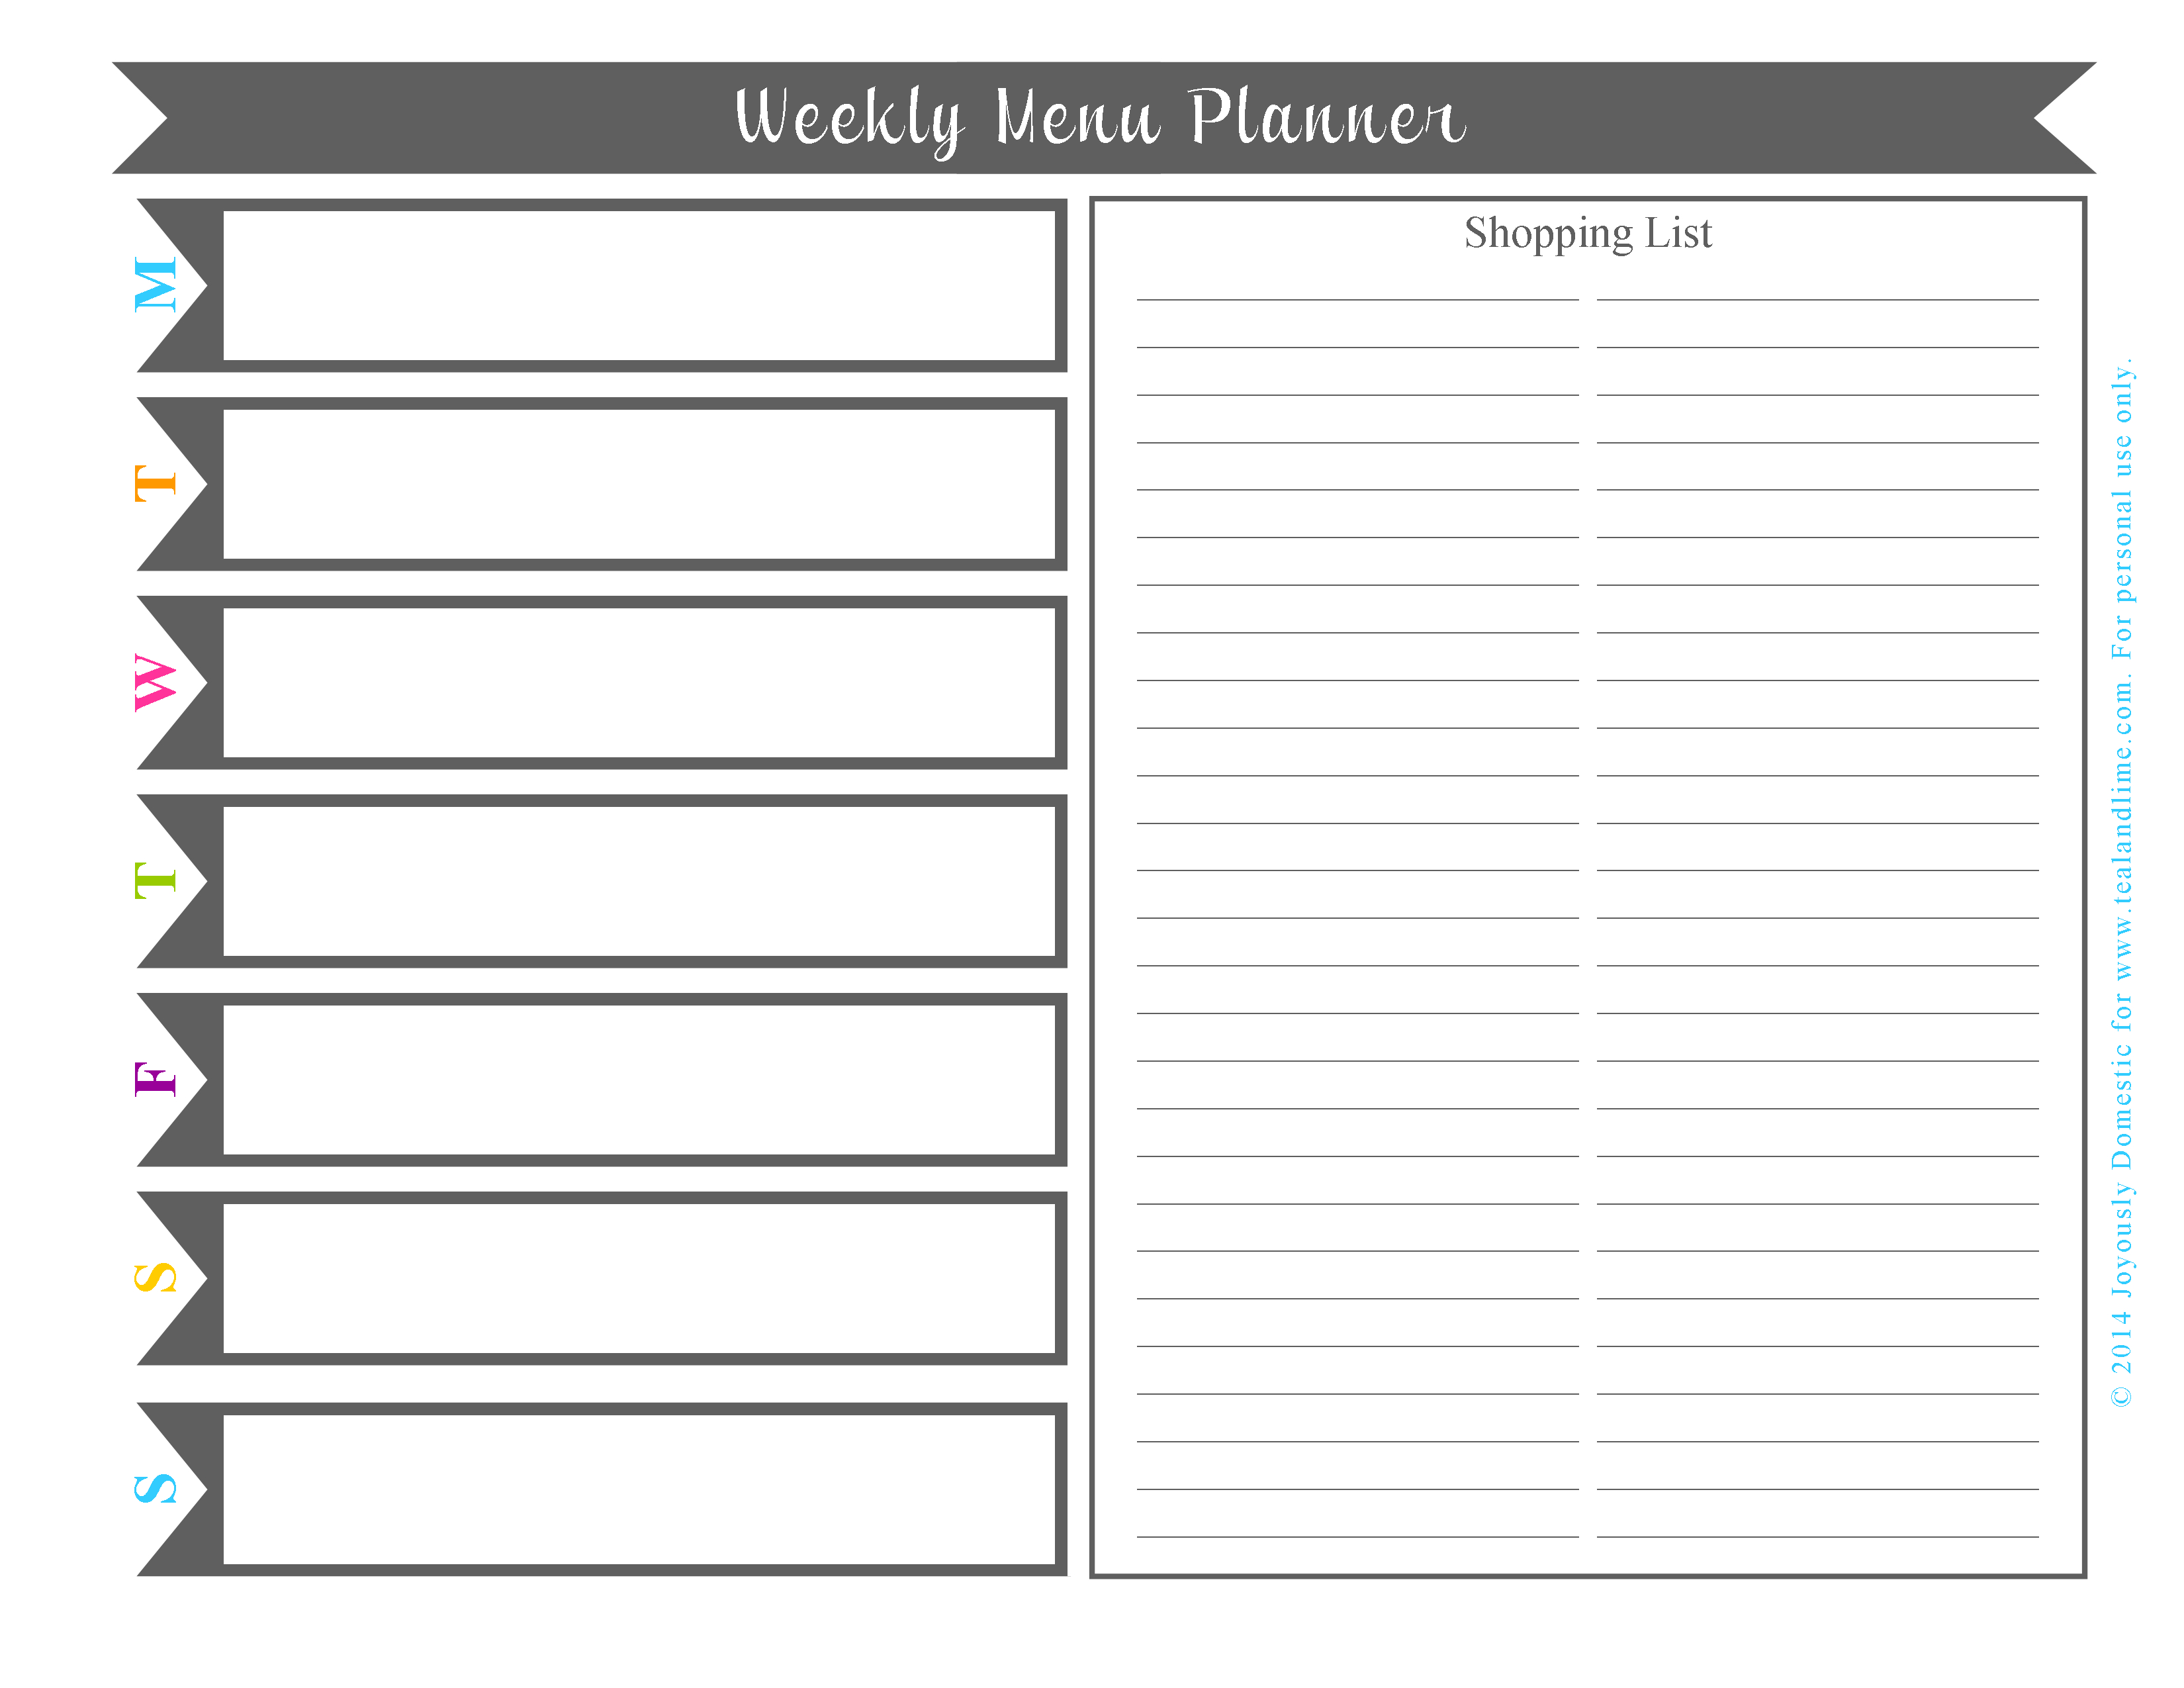 Plan Your Weekly Dinner Menu In Under 30 Minutes (Free Printable) - Weekly Menu Free Printable